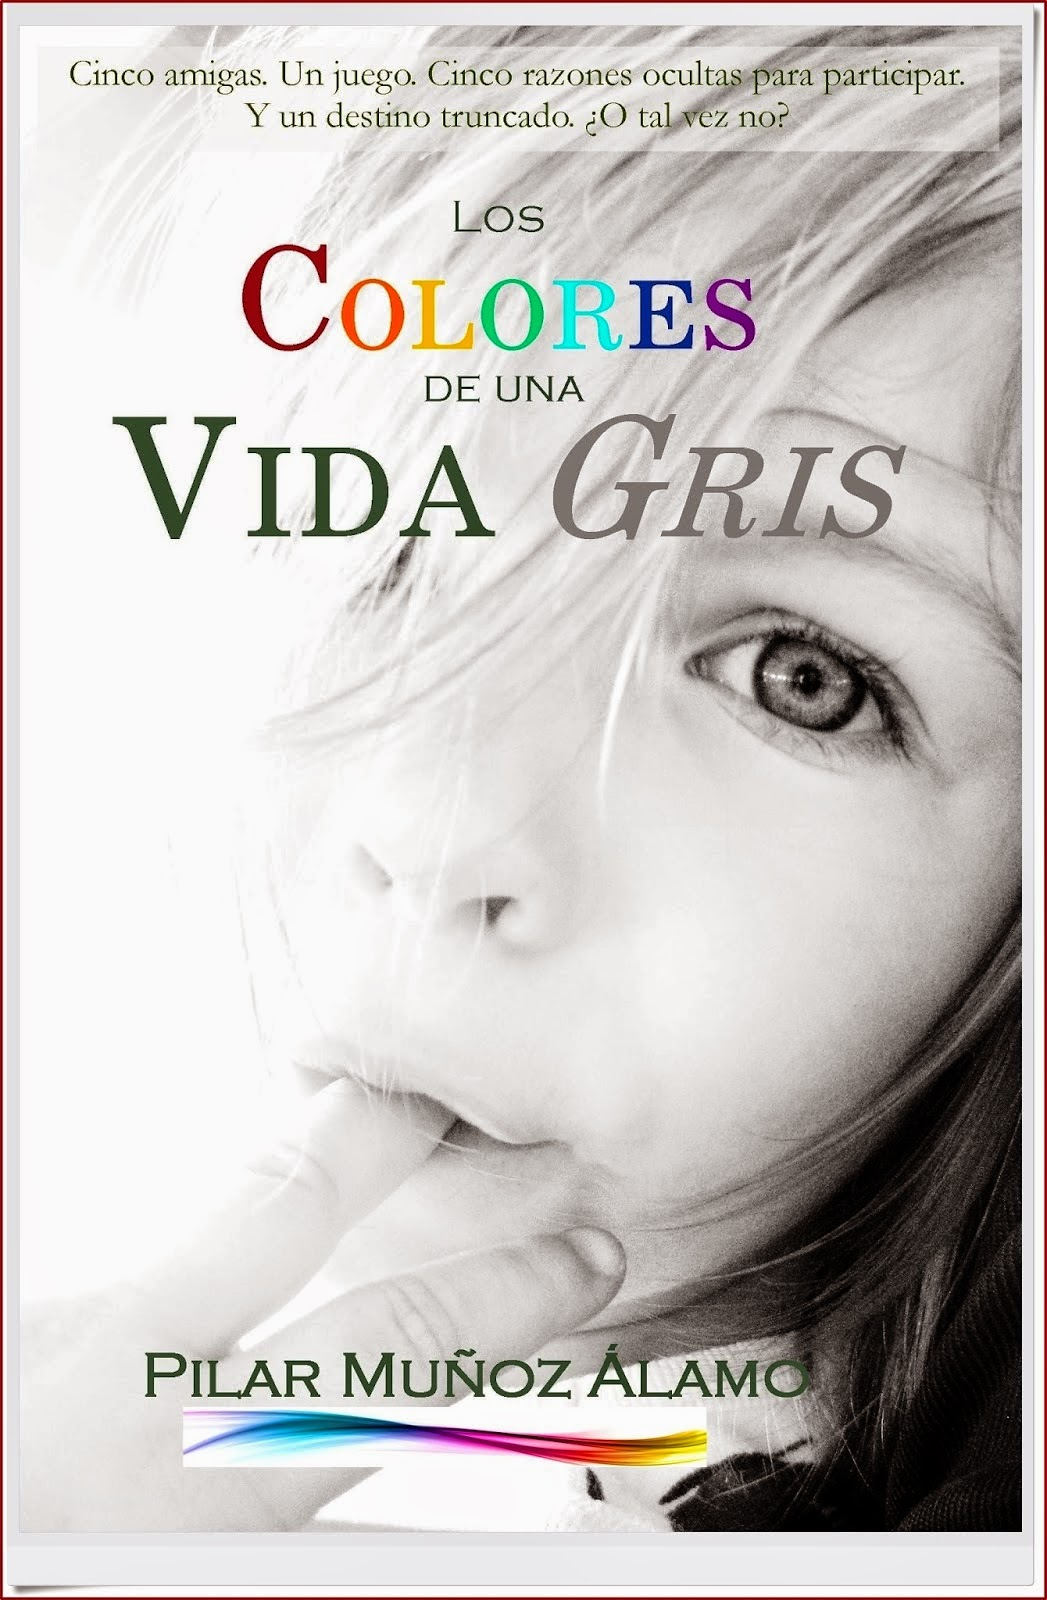 http://estantesllenos.blogspot.com/2014/06/los-colores-de-una-vida-gris-pilar.html